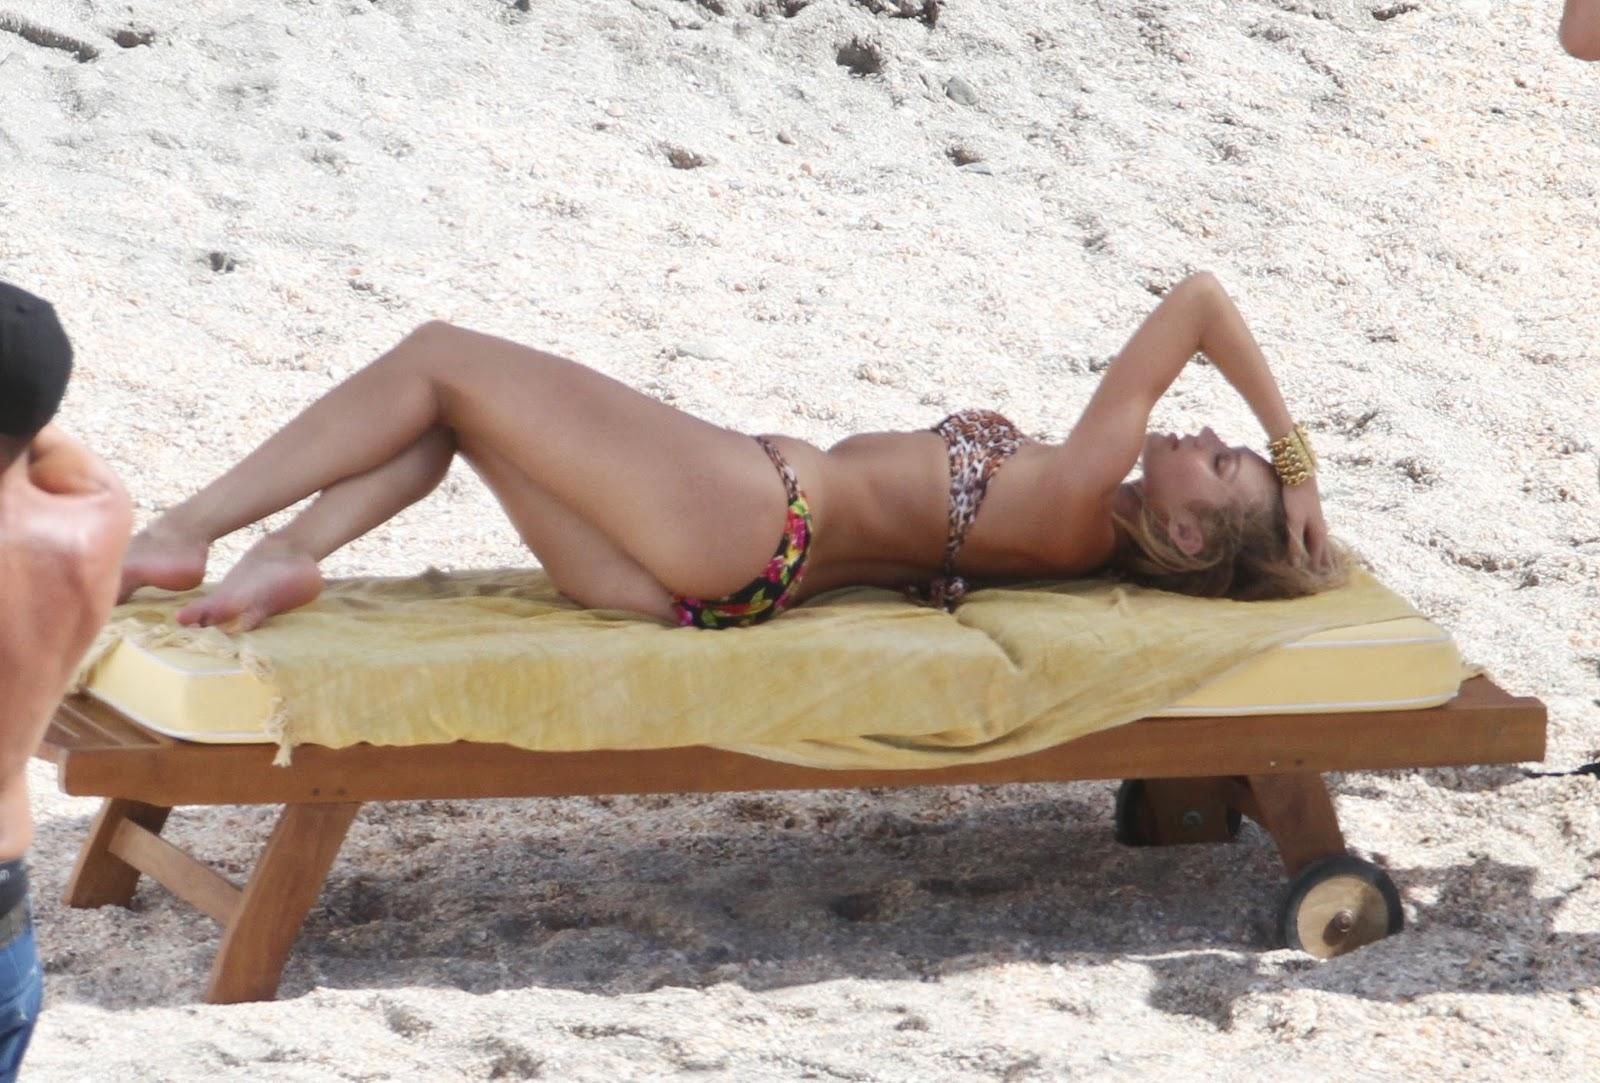 http://3.bp.blogspot.com/-DuAaOMq-7uc/UNFdMjUrrgI/AAAAAAABQPE/IBIzs34kh0U/s1600/Candice-Swanepoel-bikini-shoot+(3).jpg